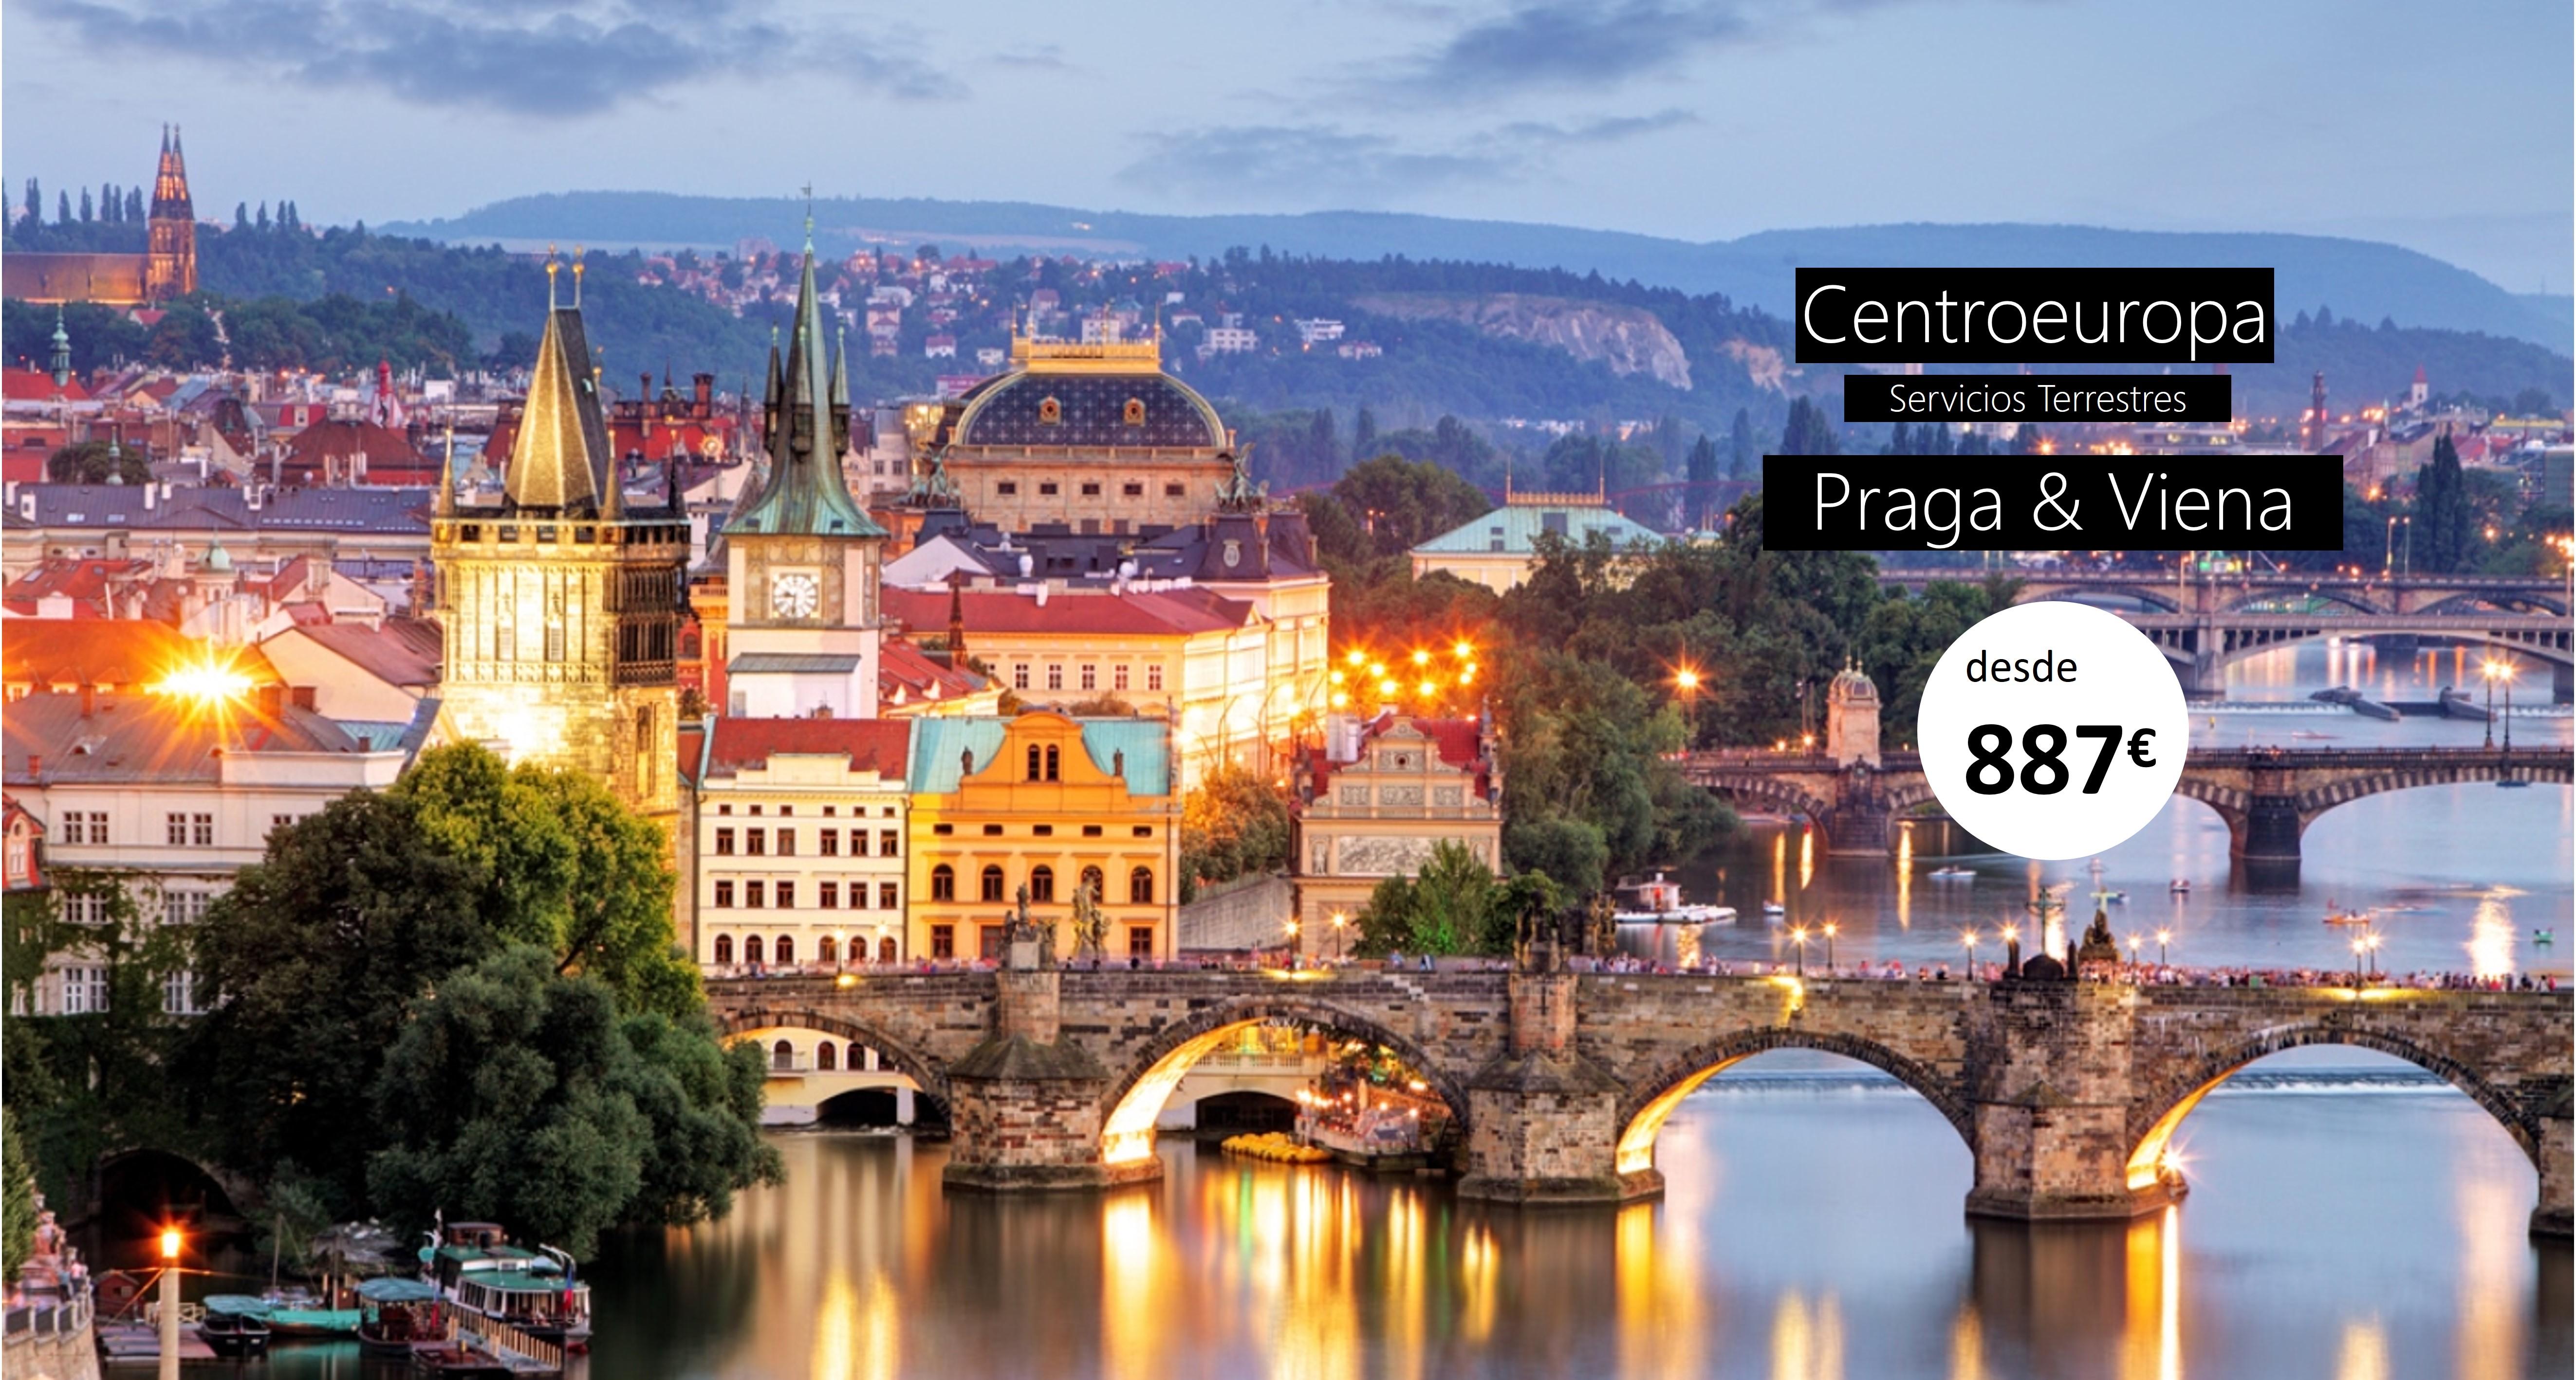 CENTROEUROPA - Praga&Viena